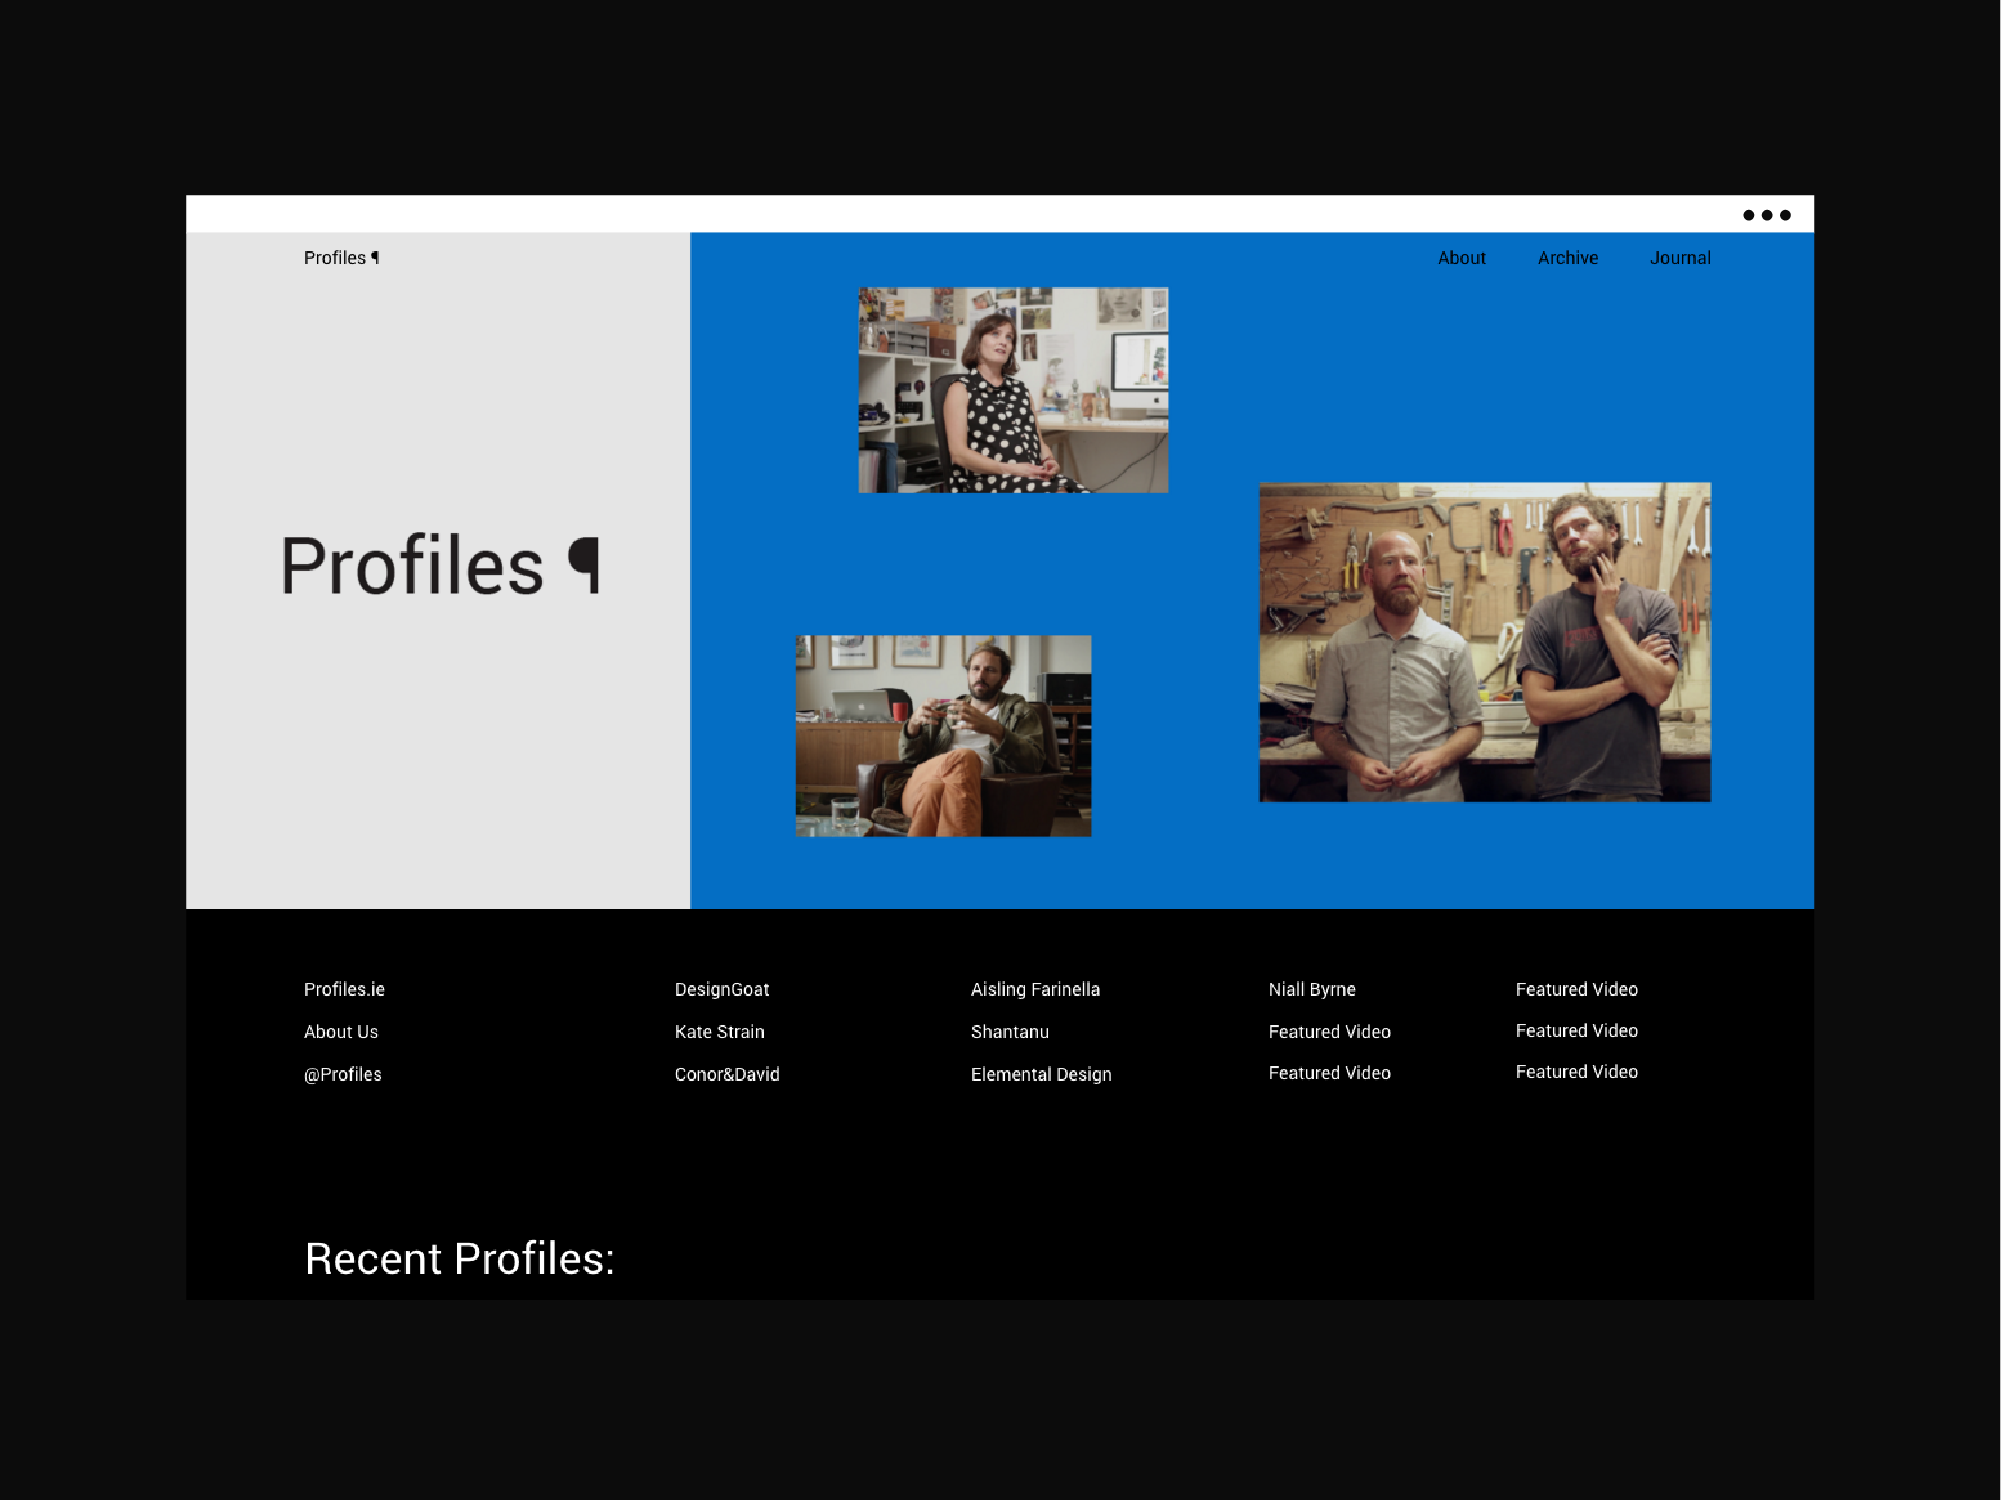 Cover image: Profiles [2015]